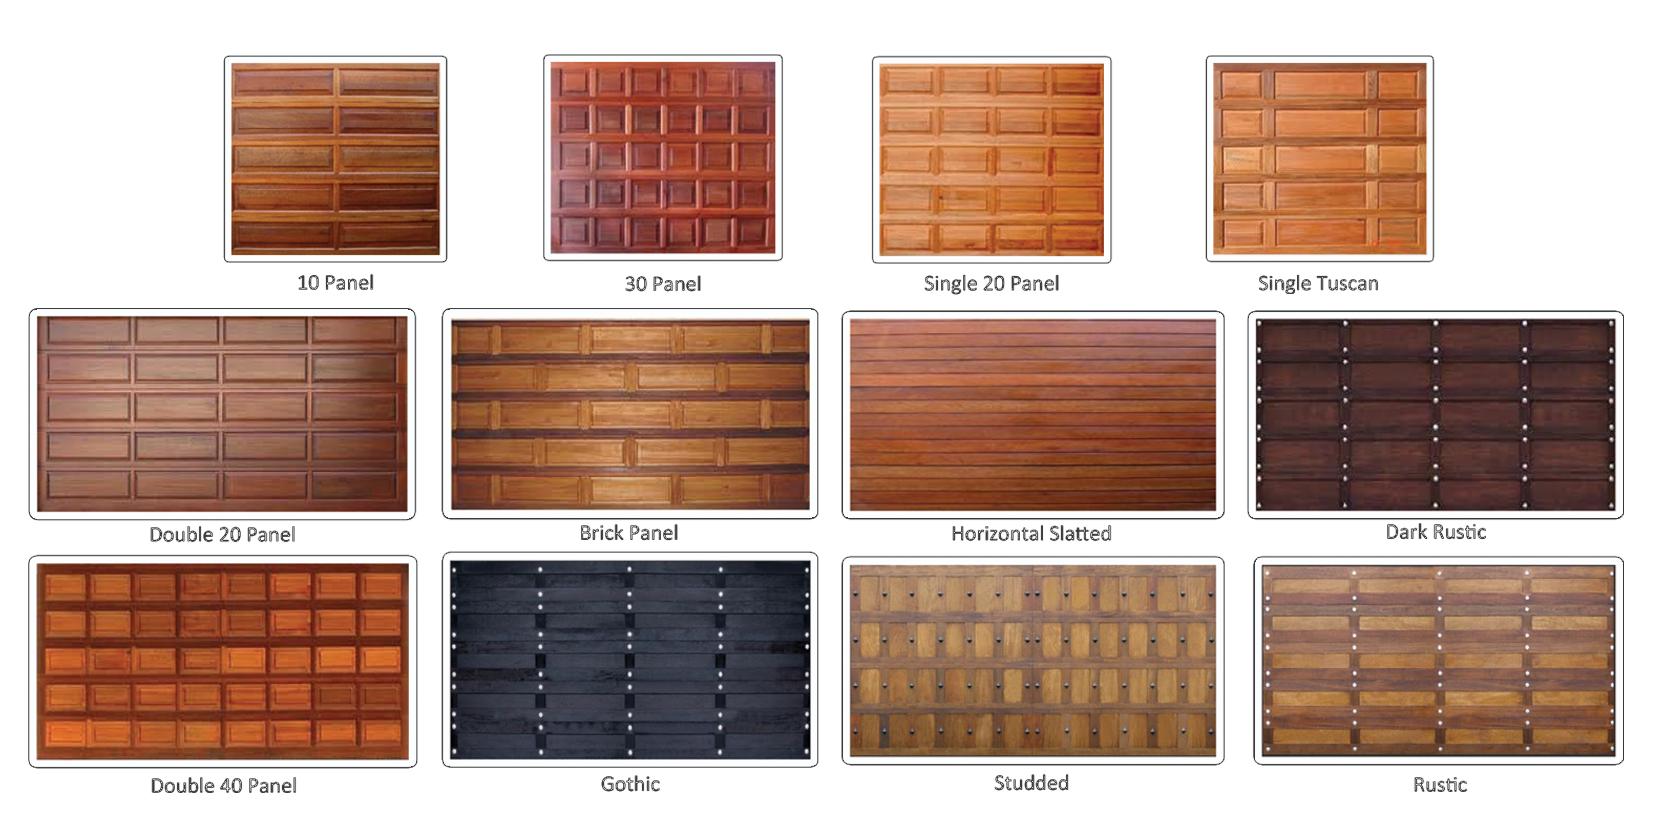 Kj House Of Doors Garage Door Spring Repairs 063 285 6120 Bordeaux